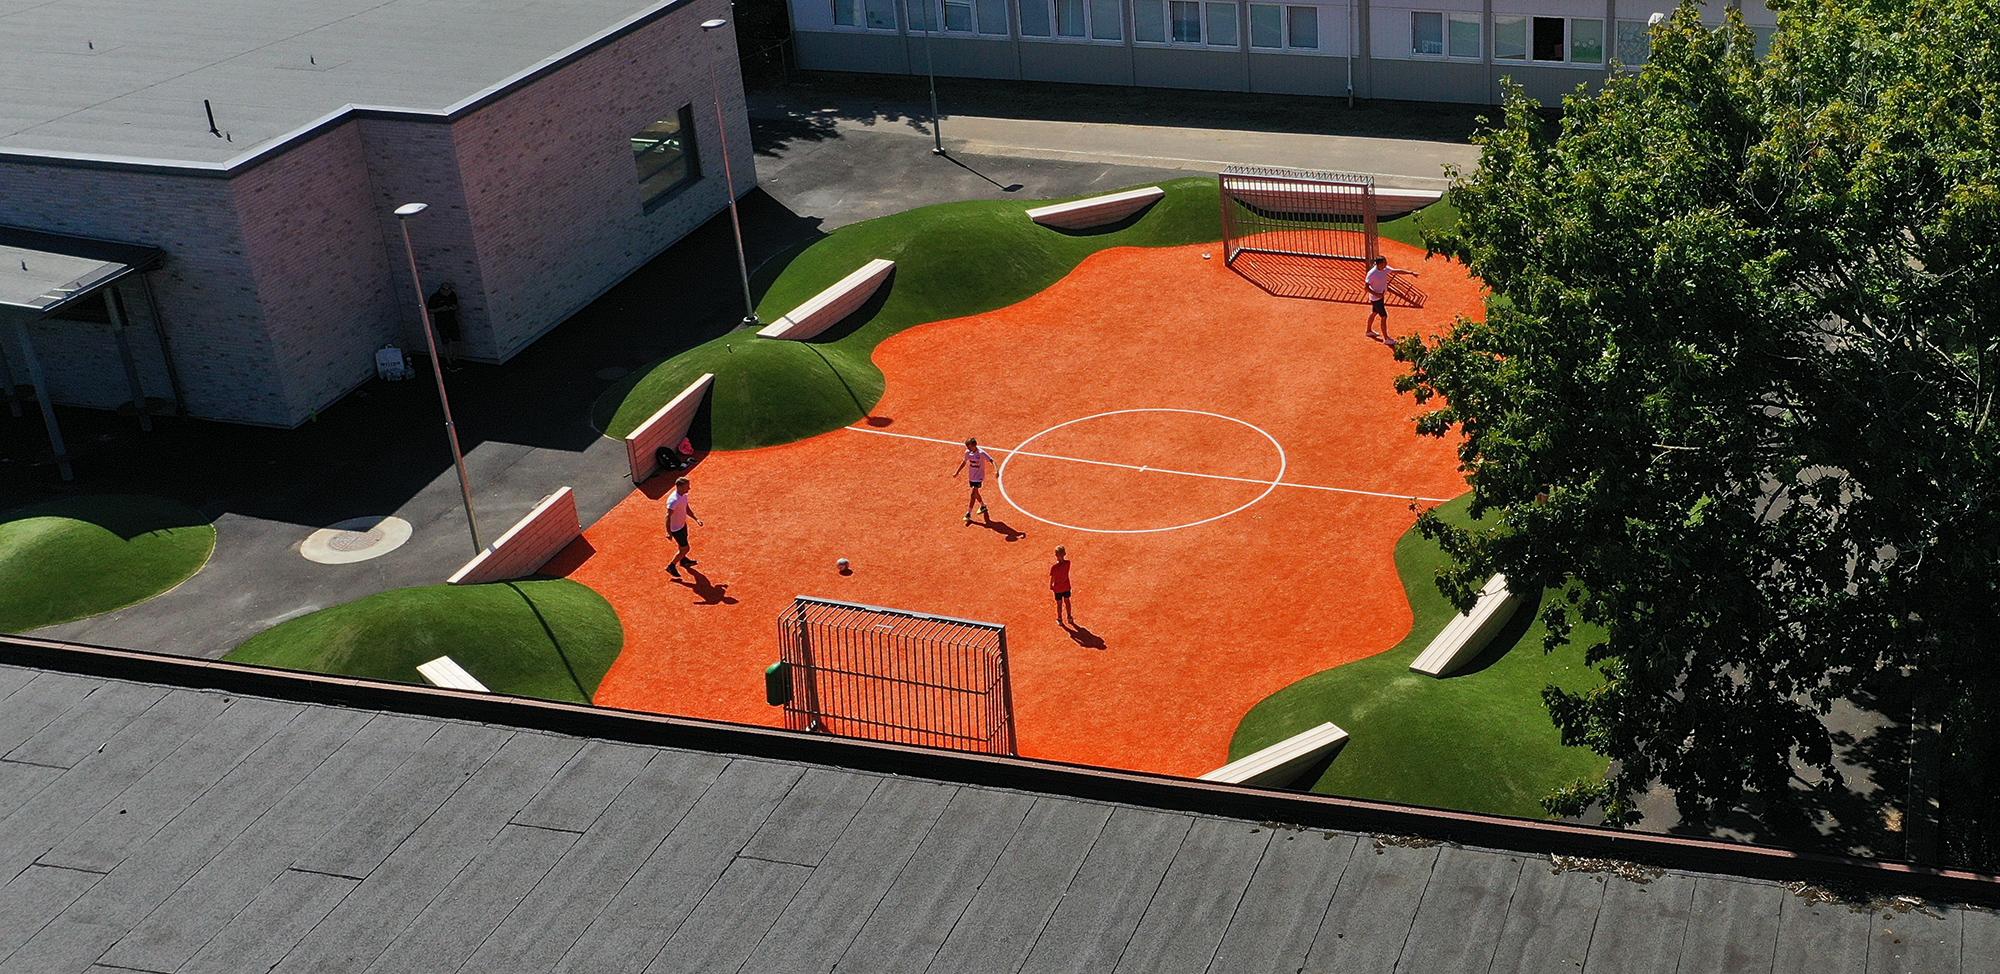 utemiljö skolgård unisport löddesnässkolan bjärred